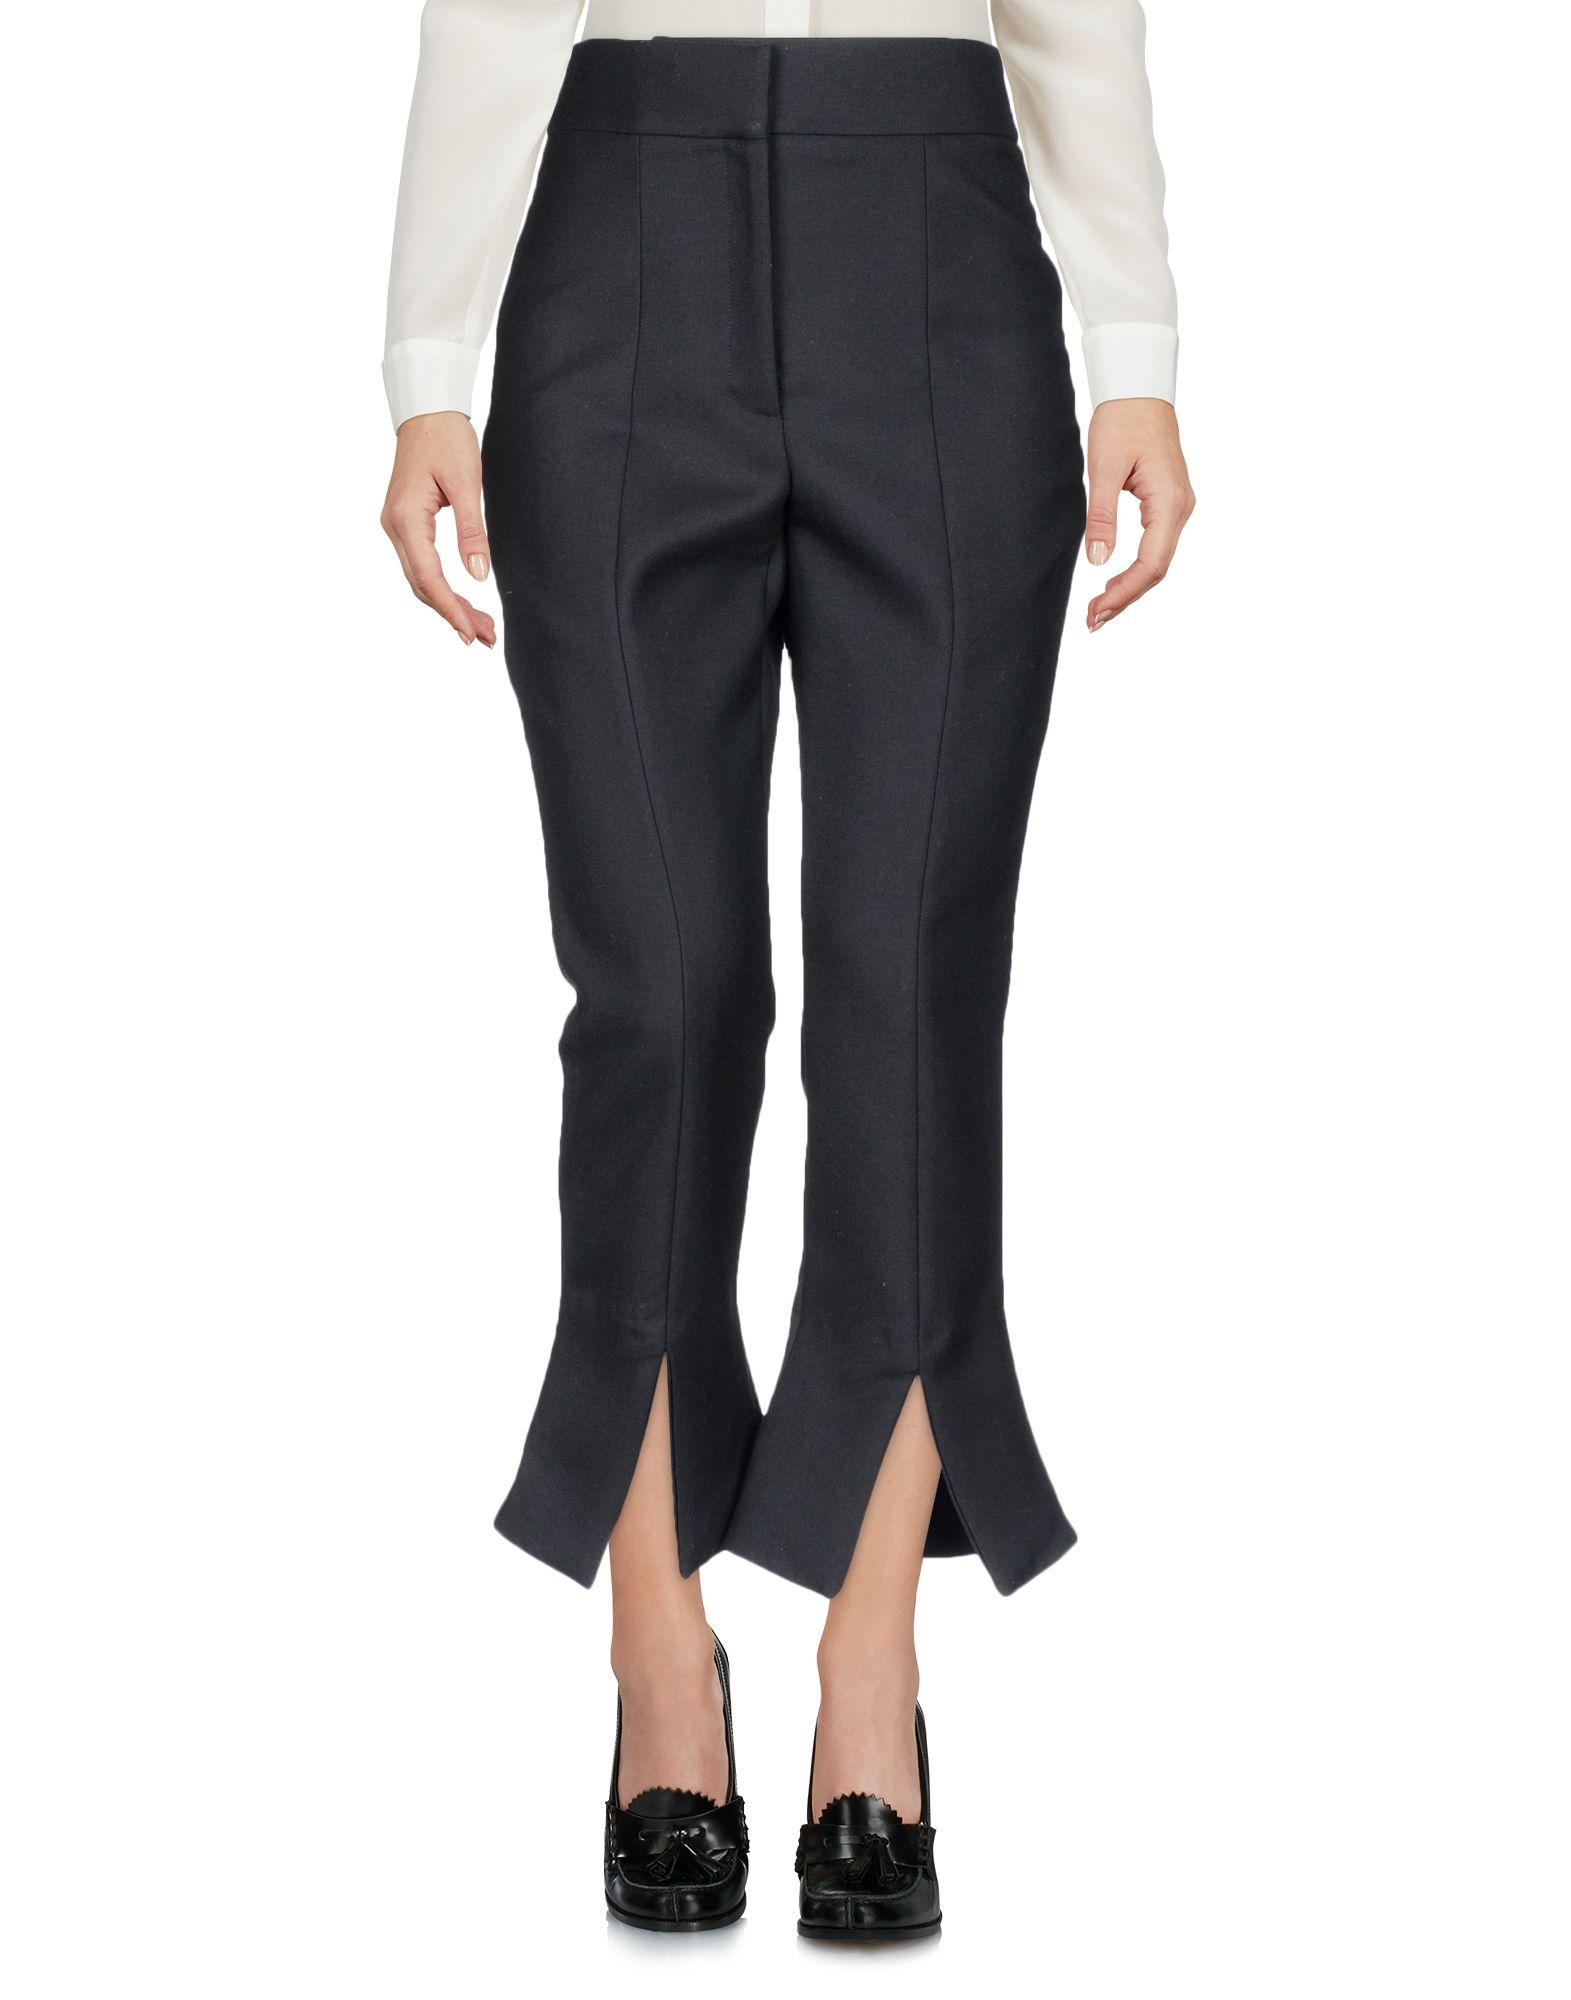 Pantalone Jacquemus Donna - Acquista online su KaGJM